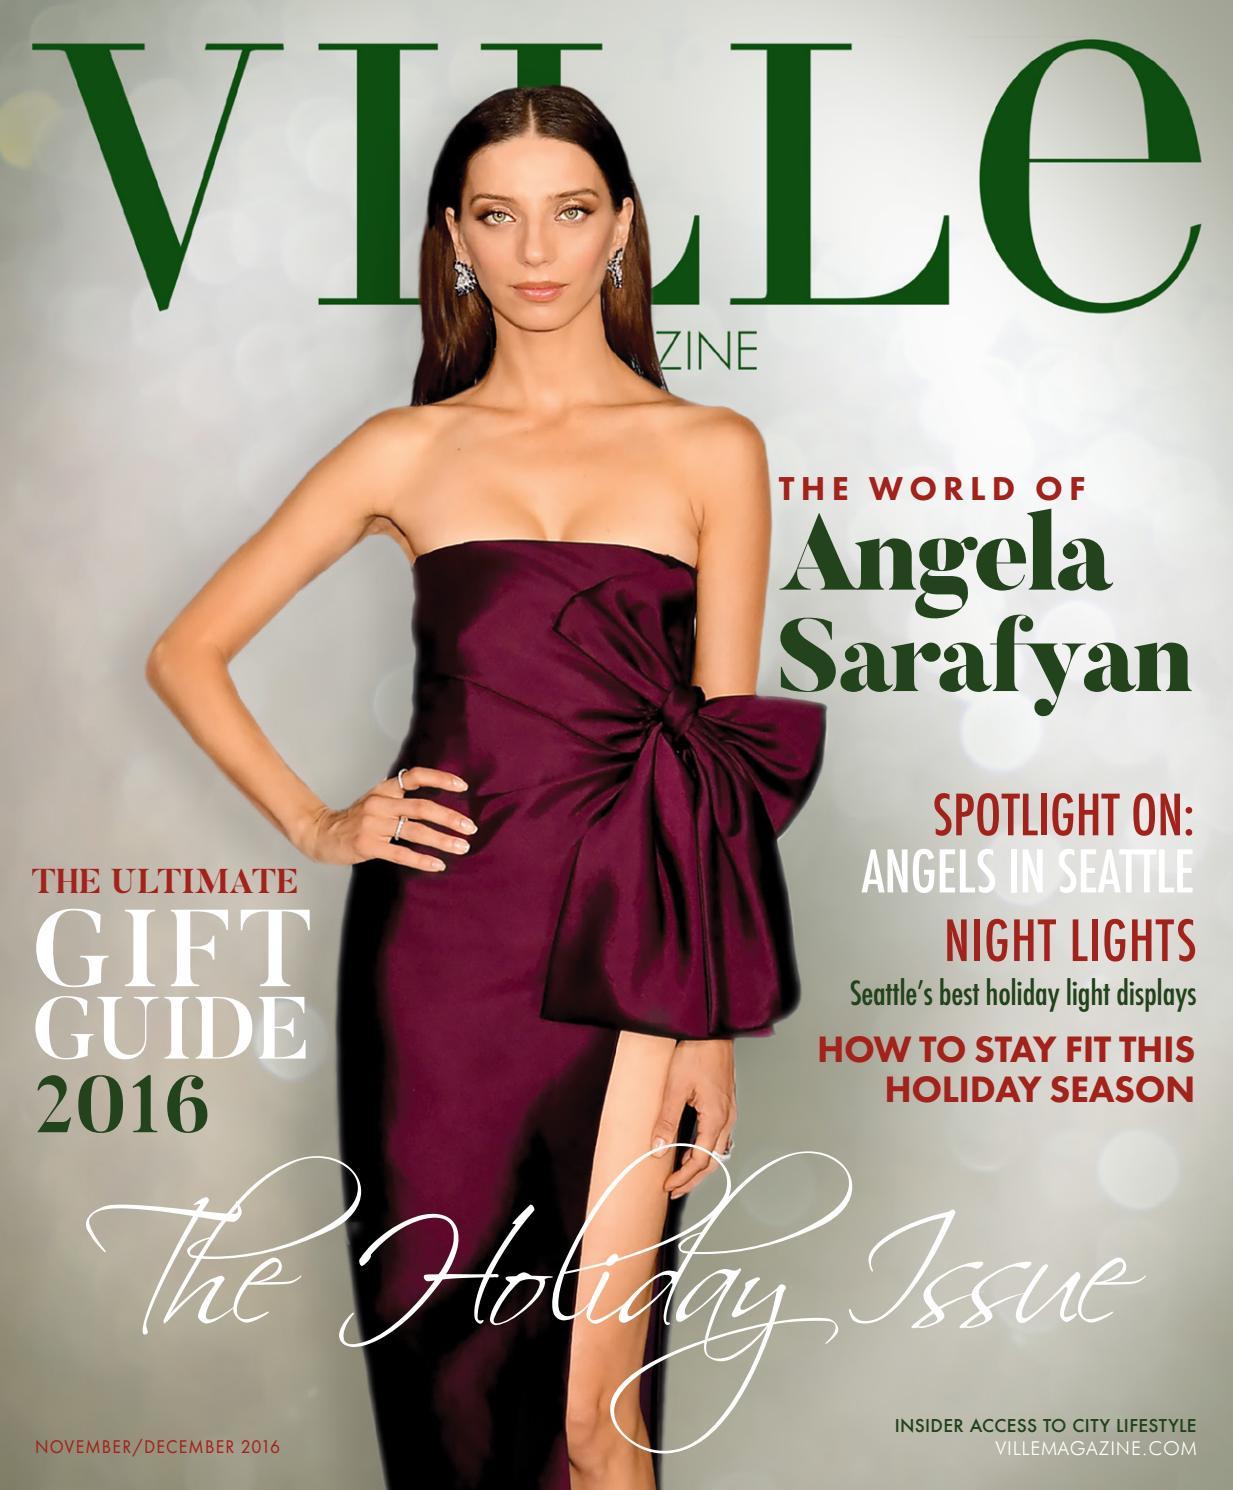 Angela Sarafyan Tits nov/dec 2016 l the holiday issueville magazine - issuu